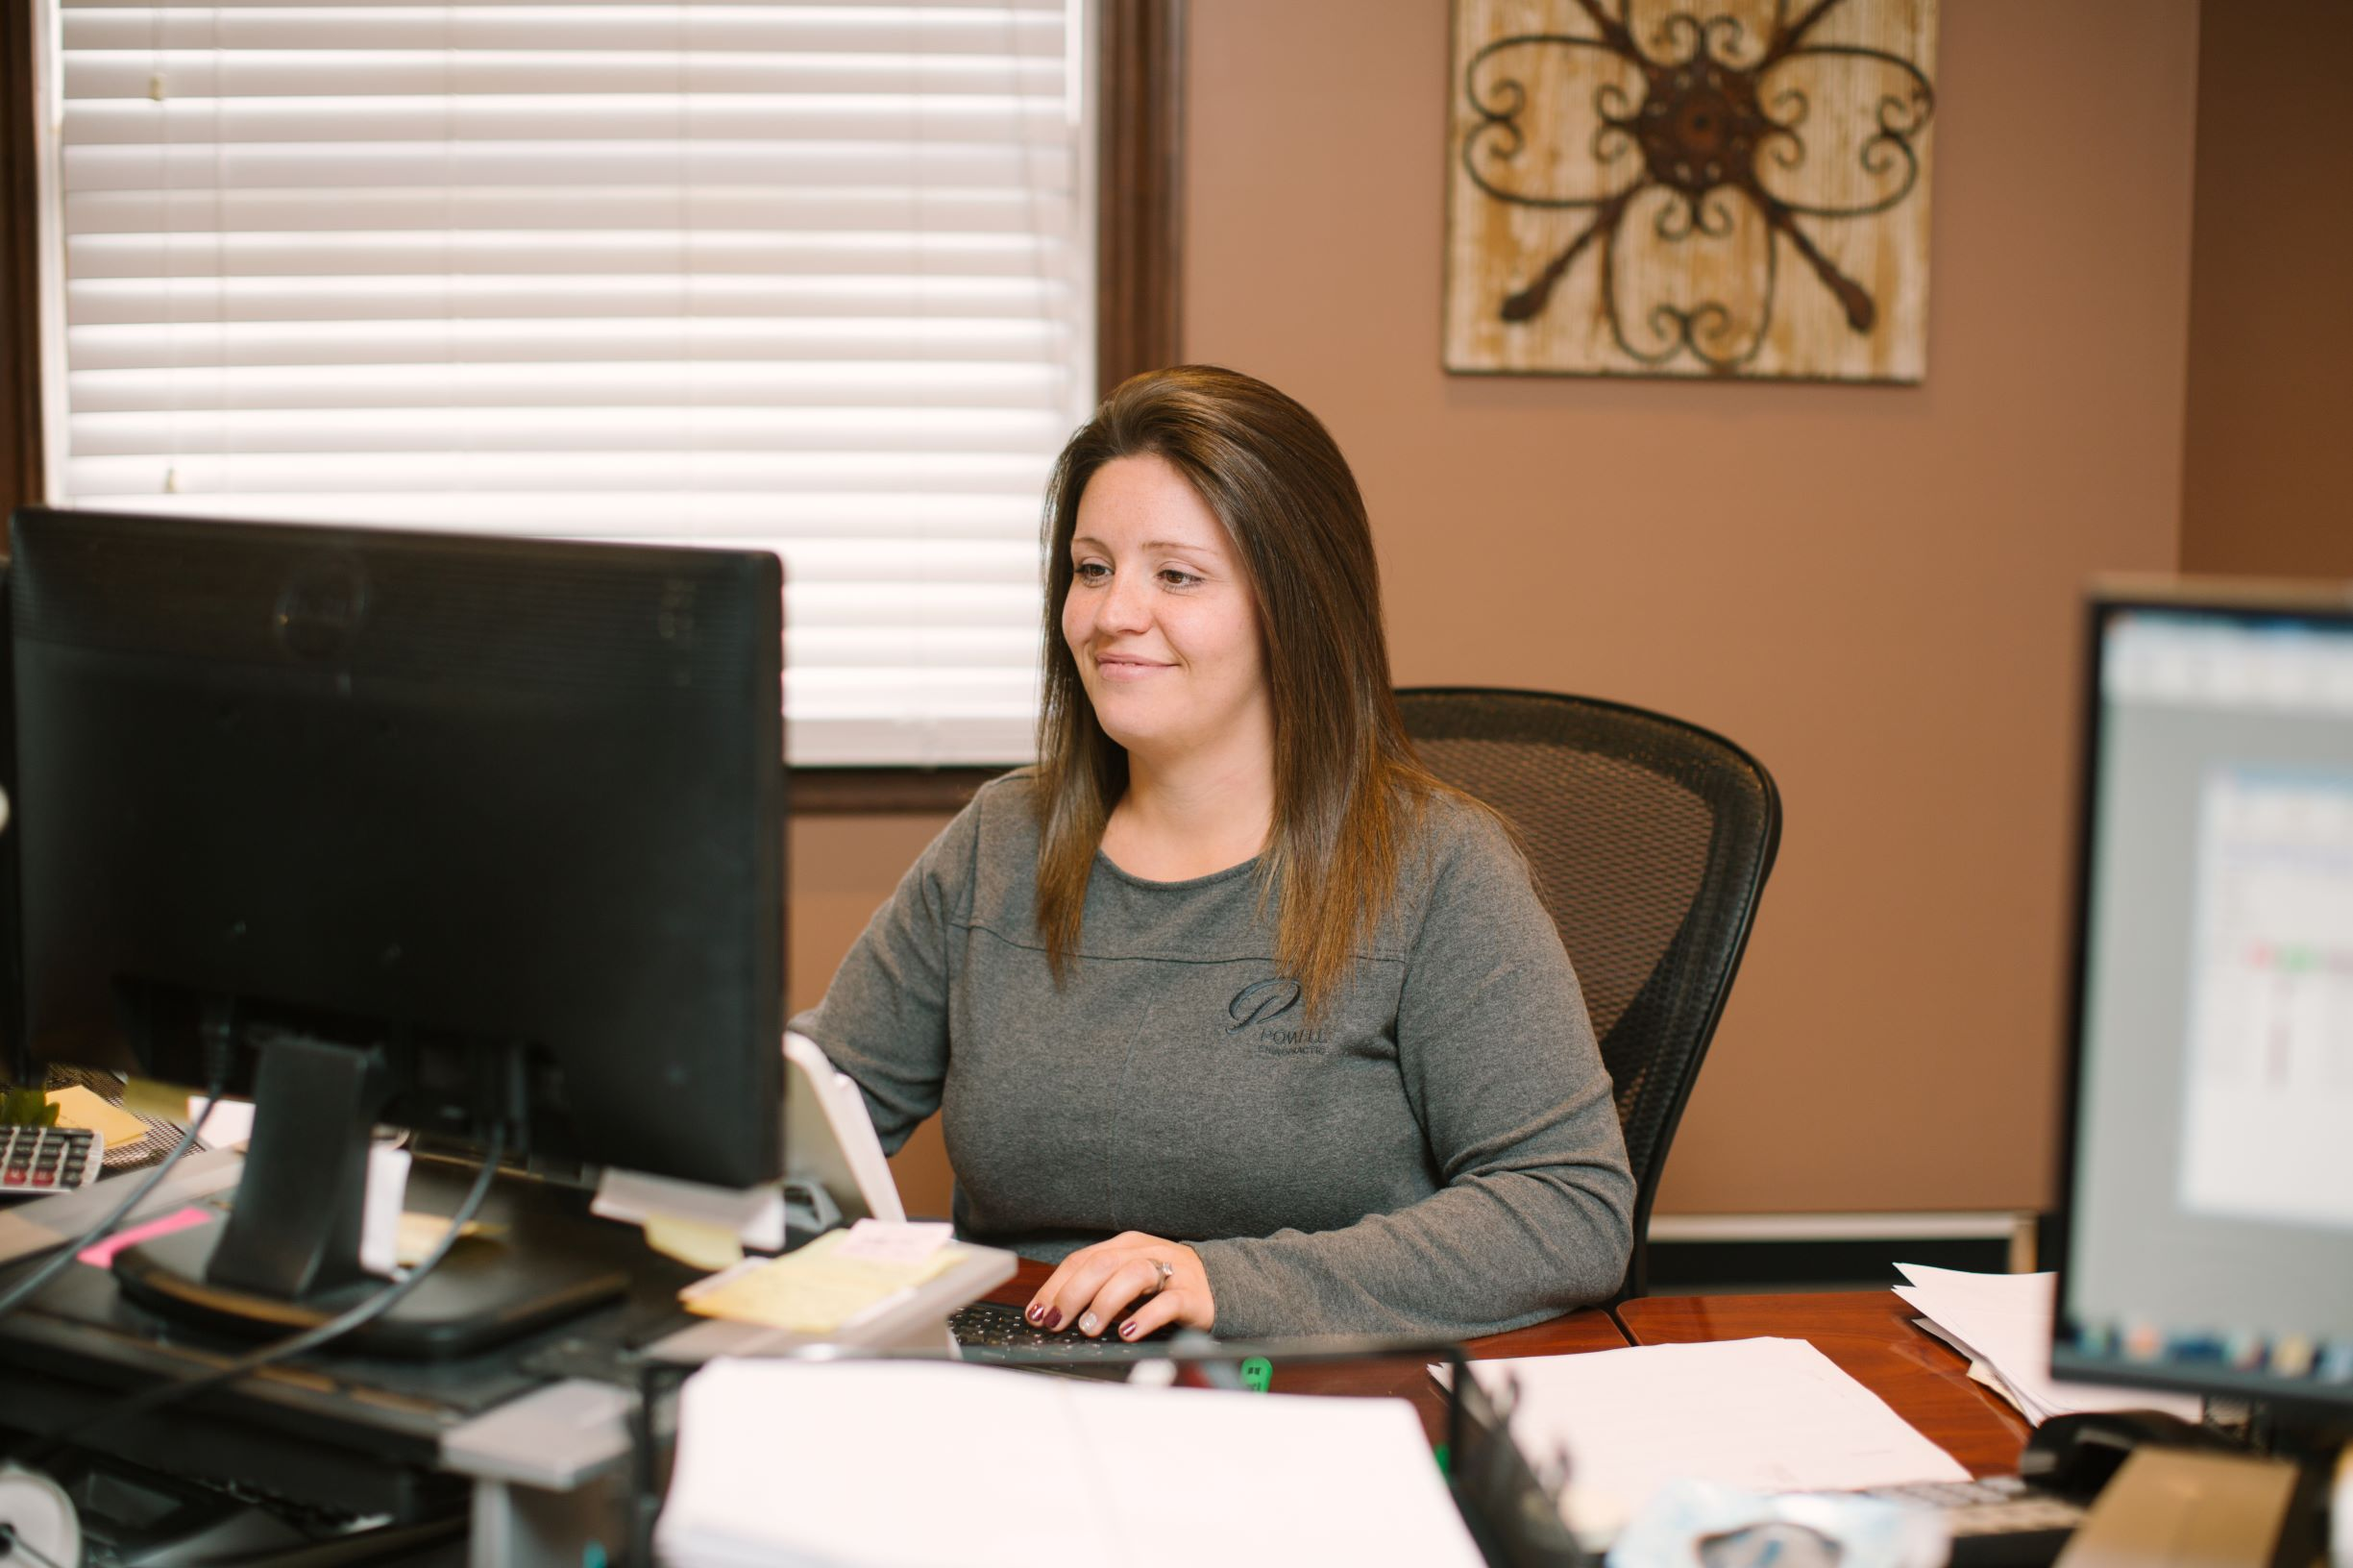 Amanda at desk